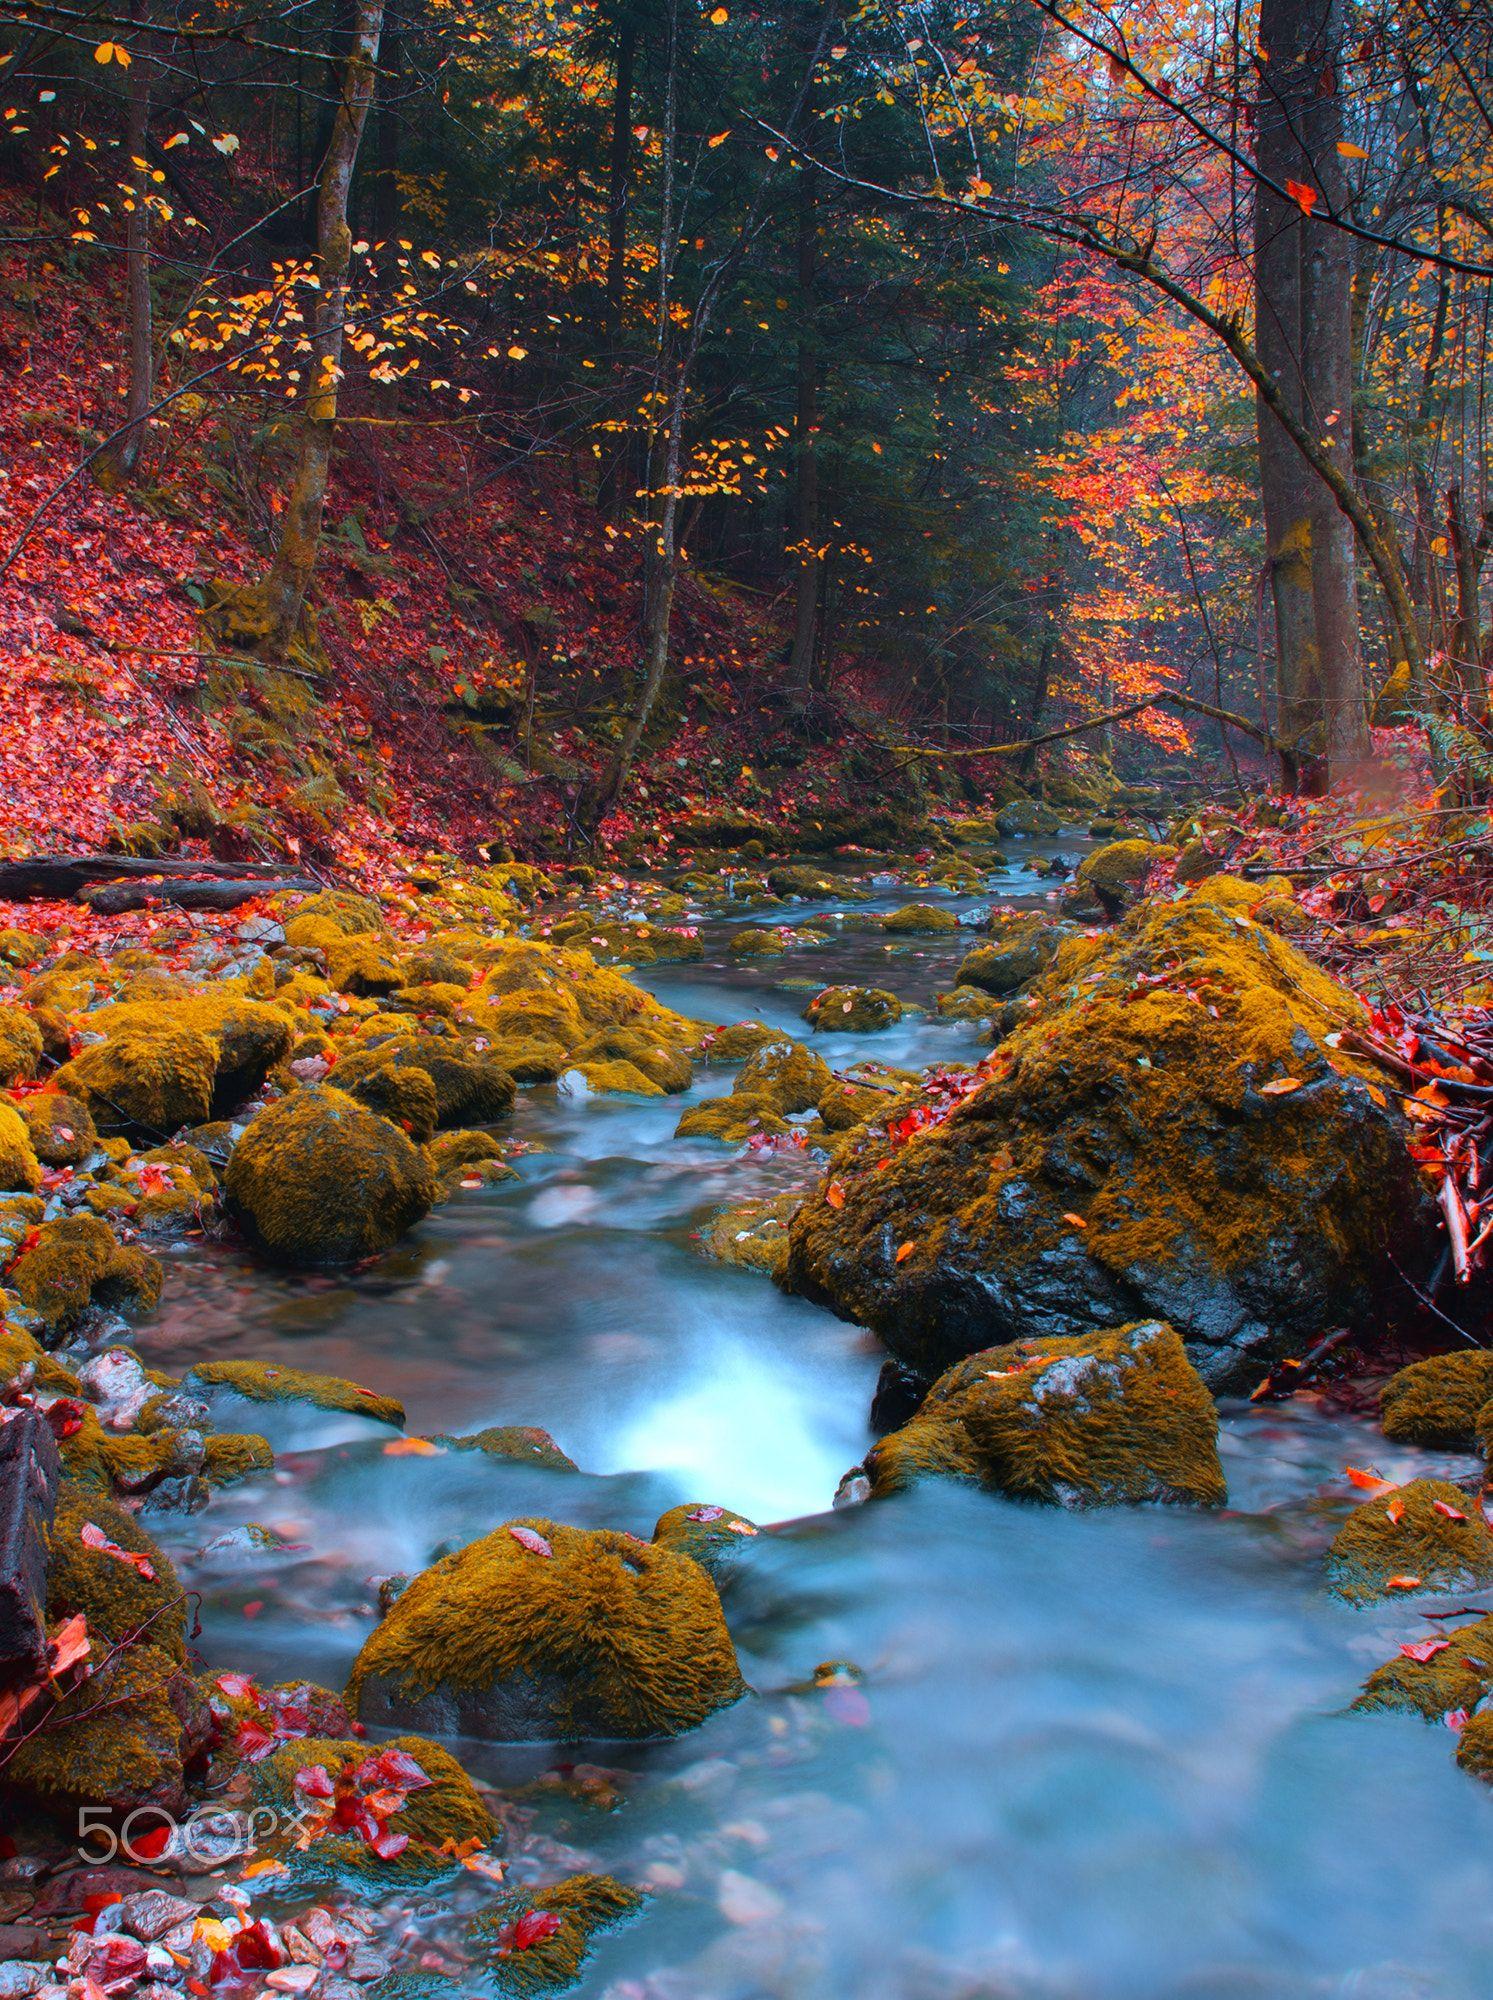 Mountain River Mt Konjuh Zlaca River Banovici Bosnia Cool Landscapes Landscape Scenery Autumn Landscape